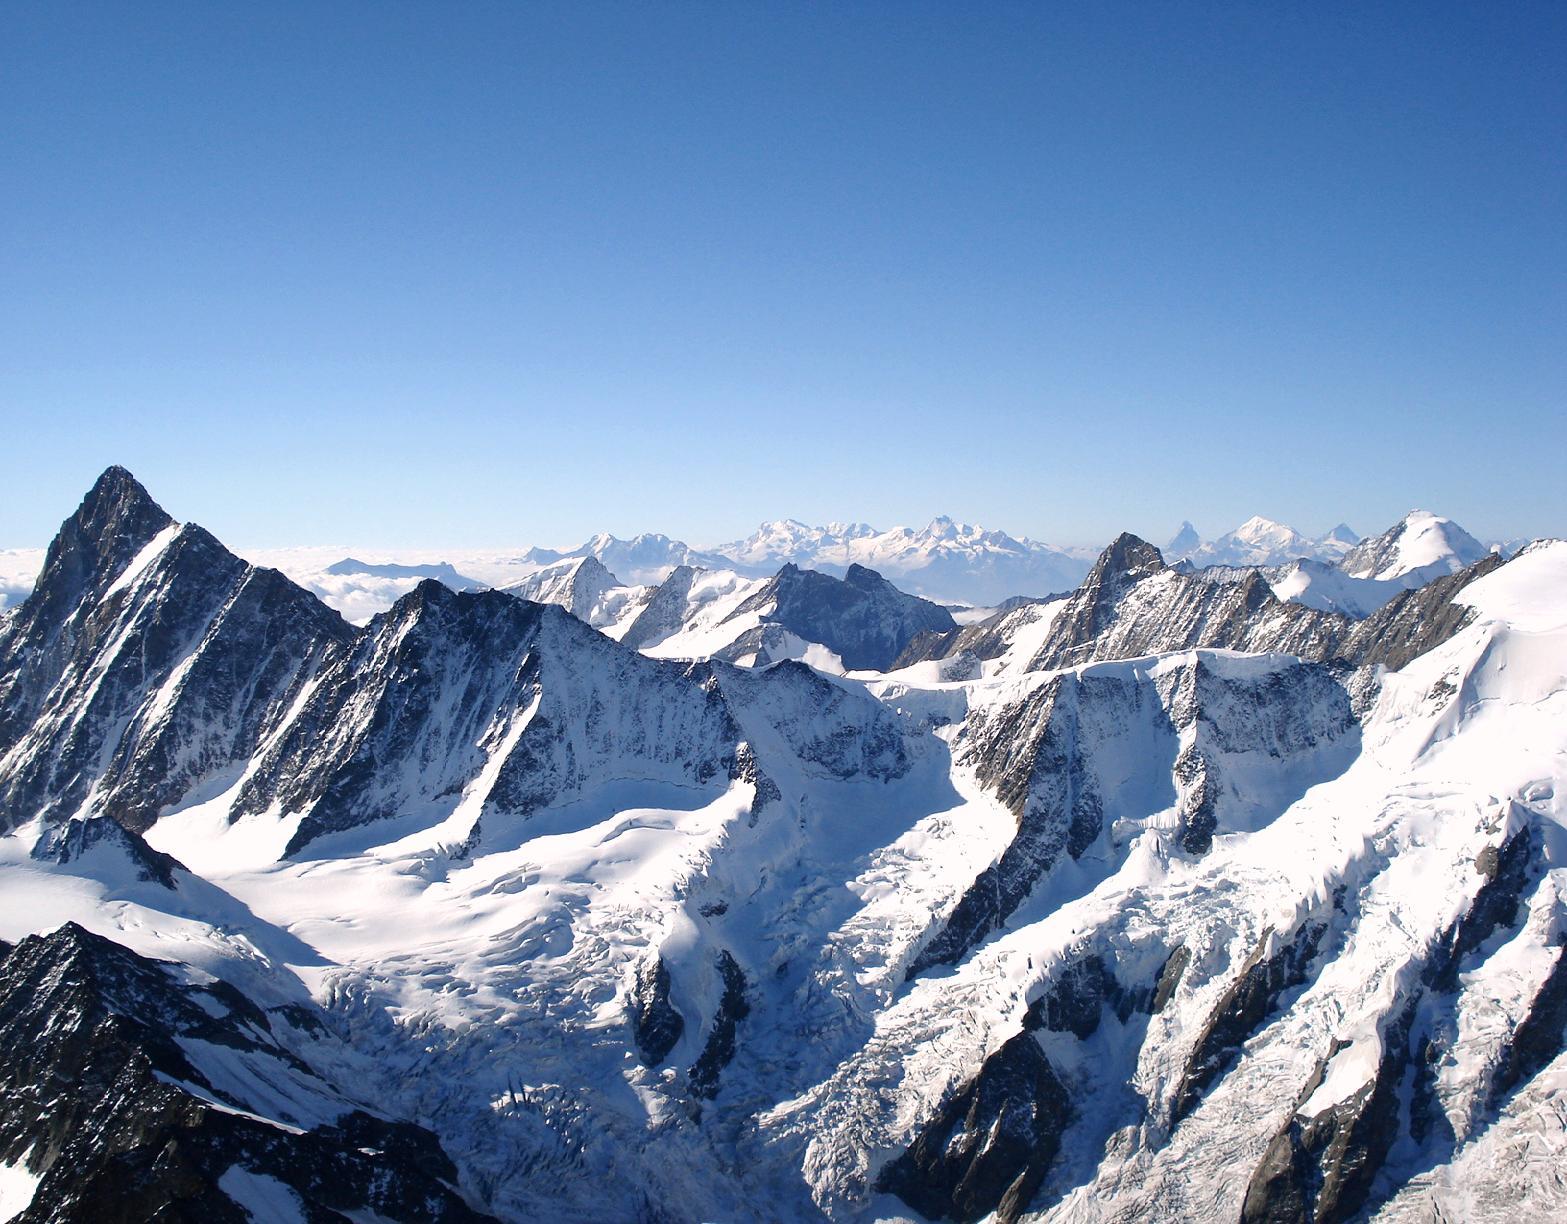 File:European Alps.jpg